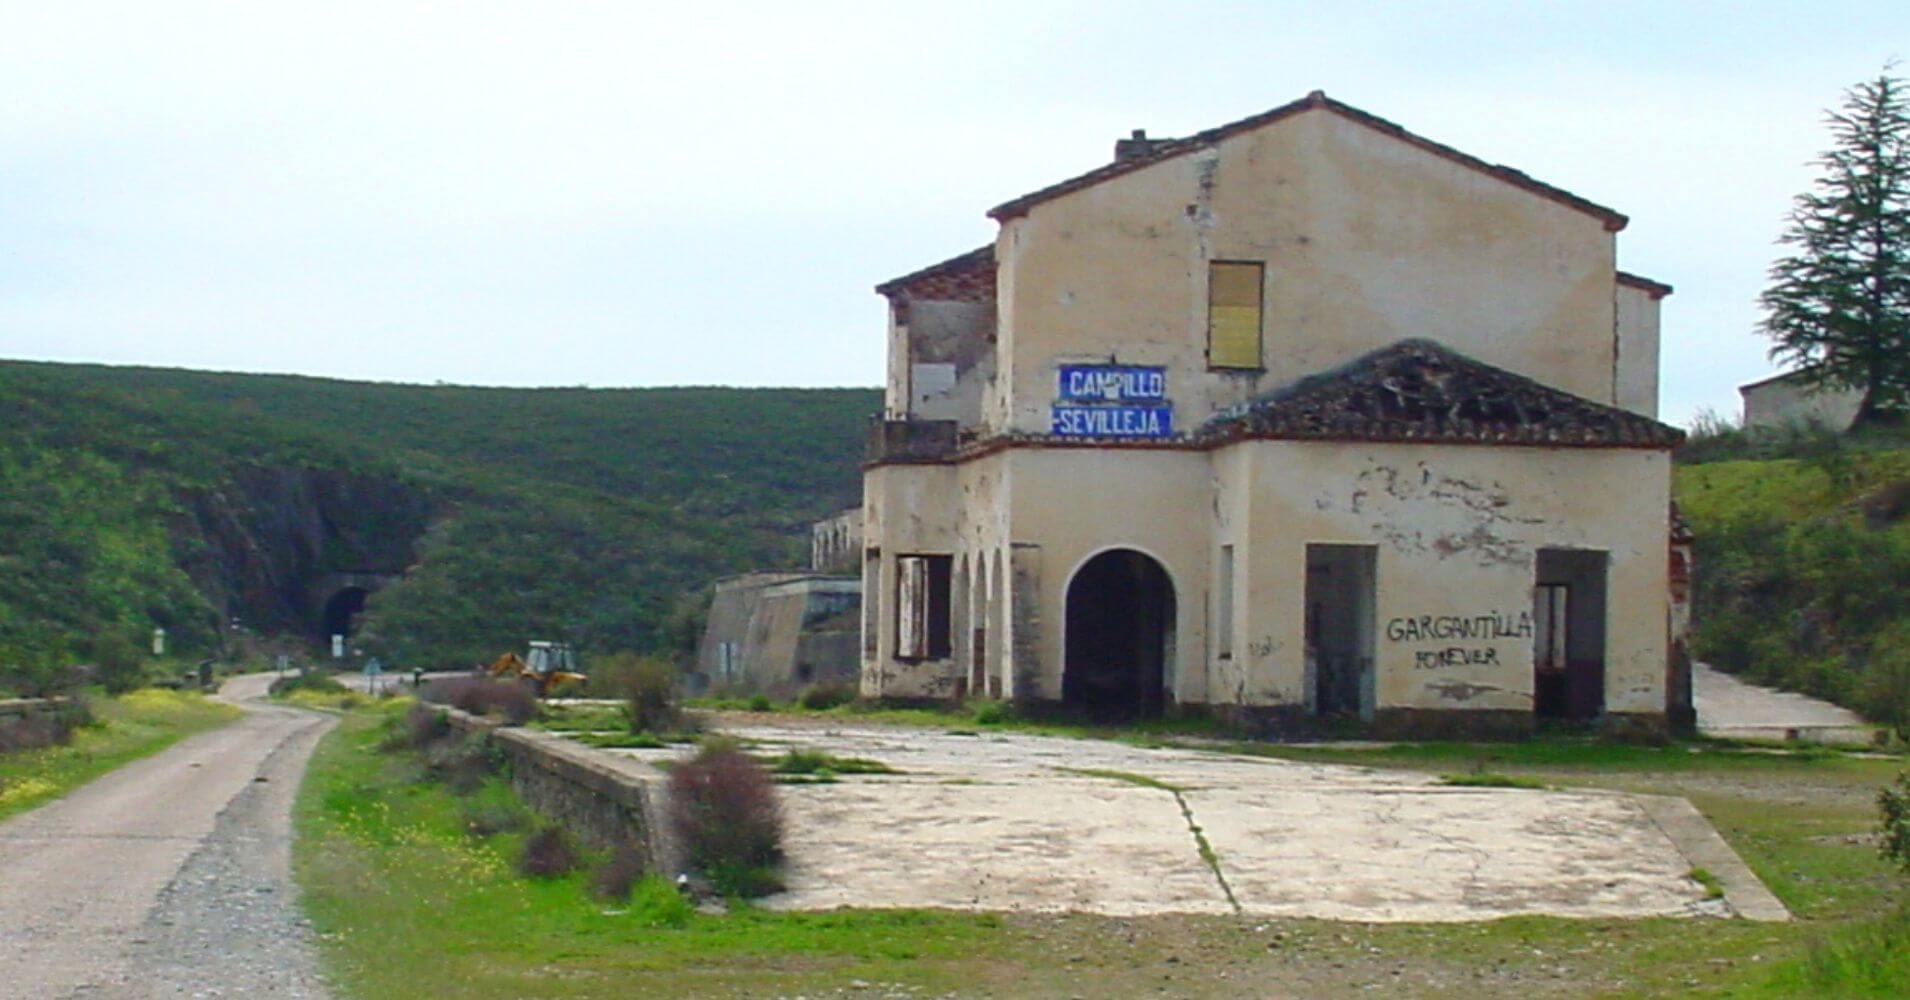 Estación Campillo Sevilleja. Toledo. Castilla la Mancha.